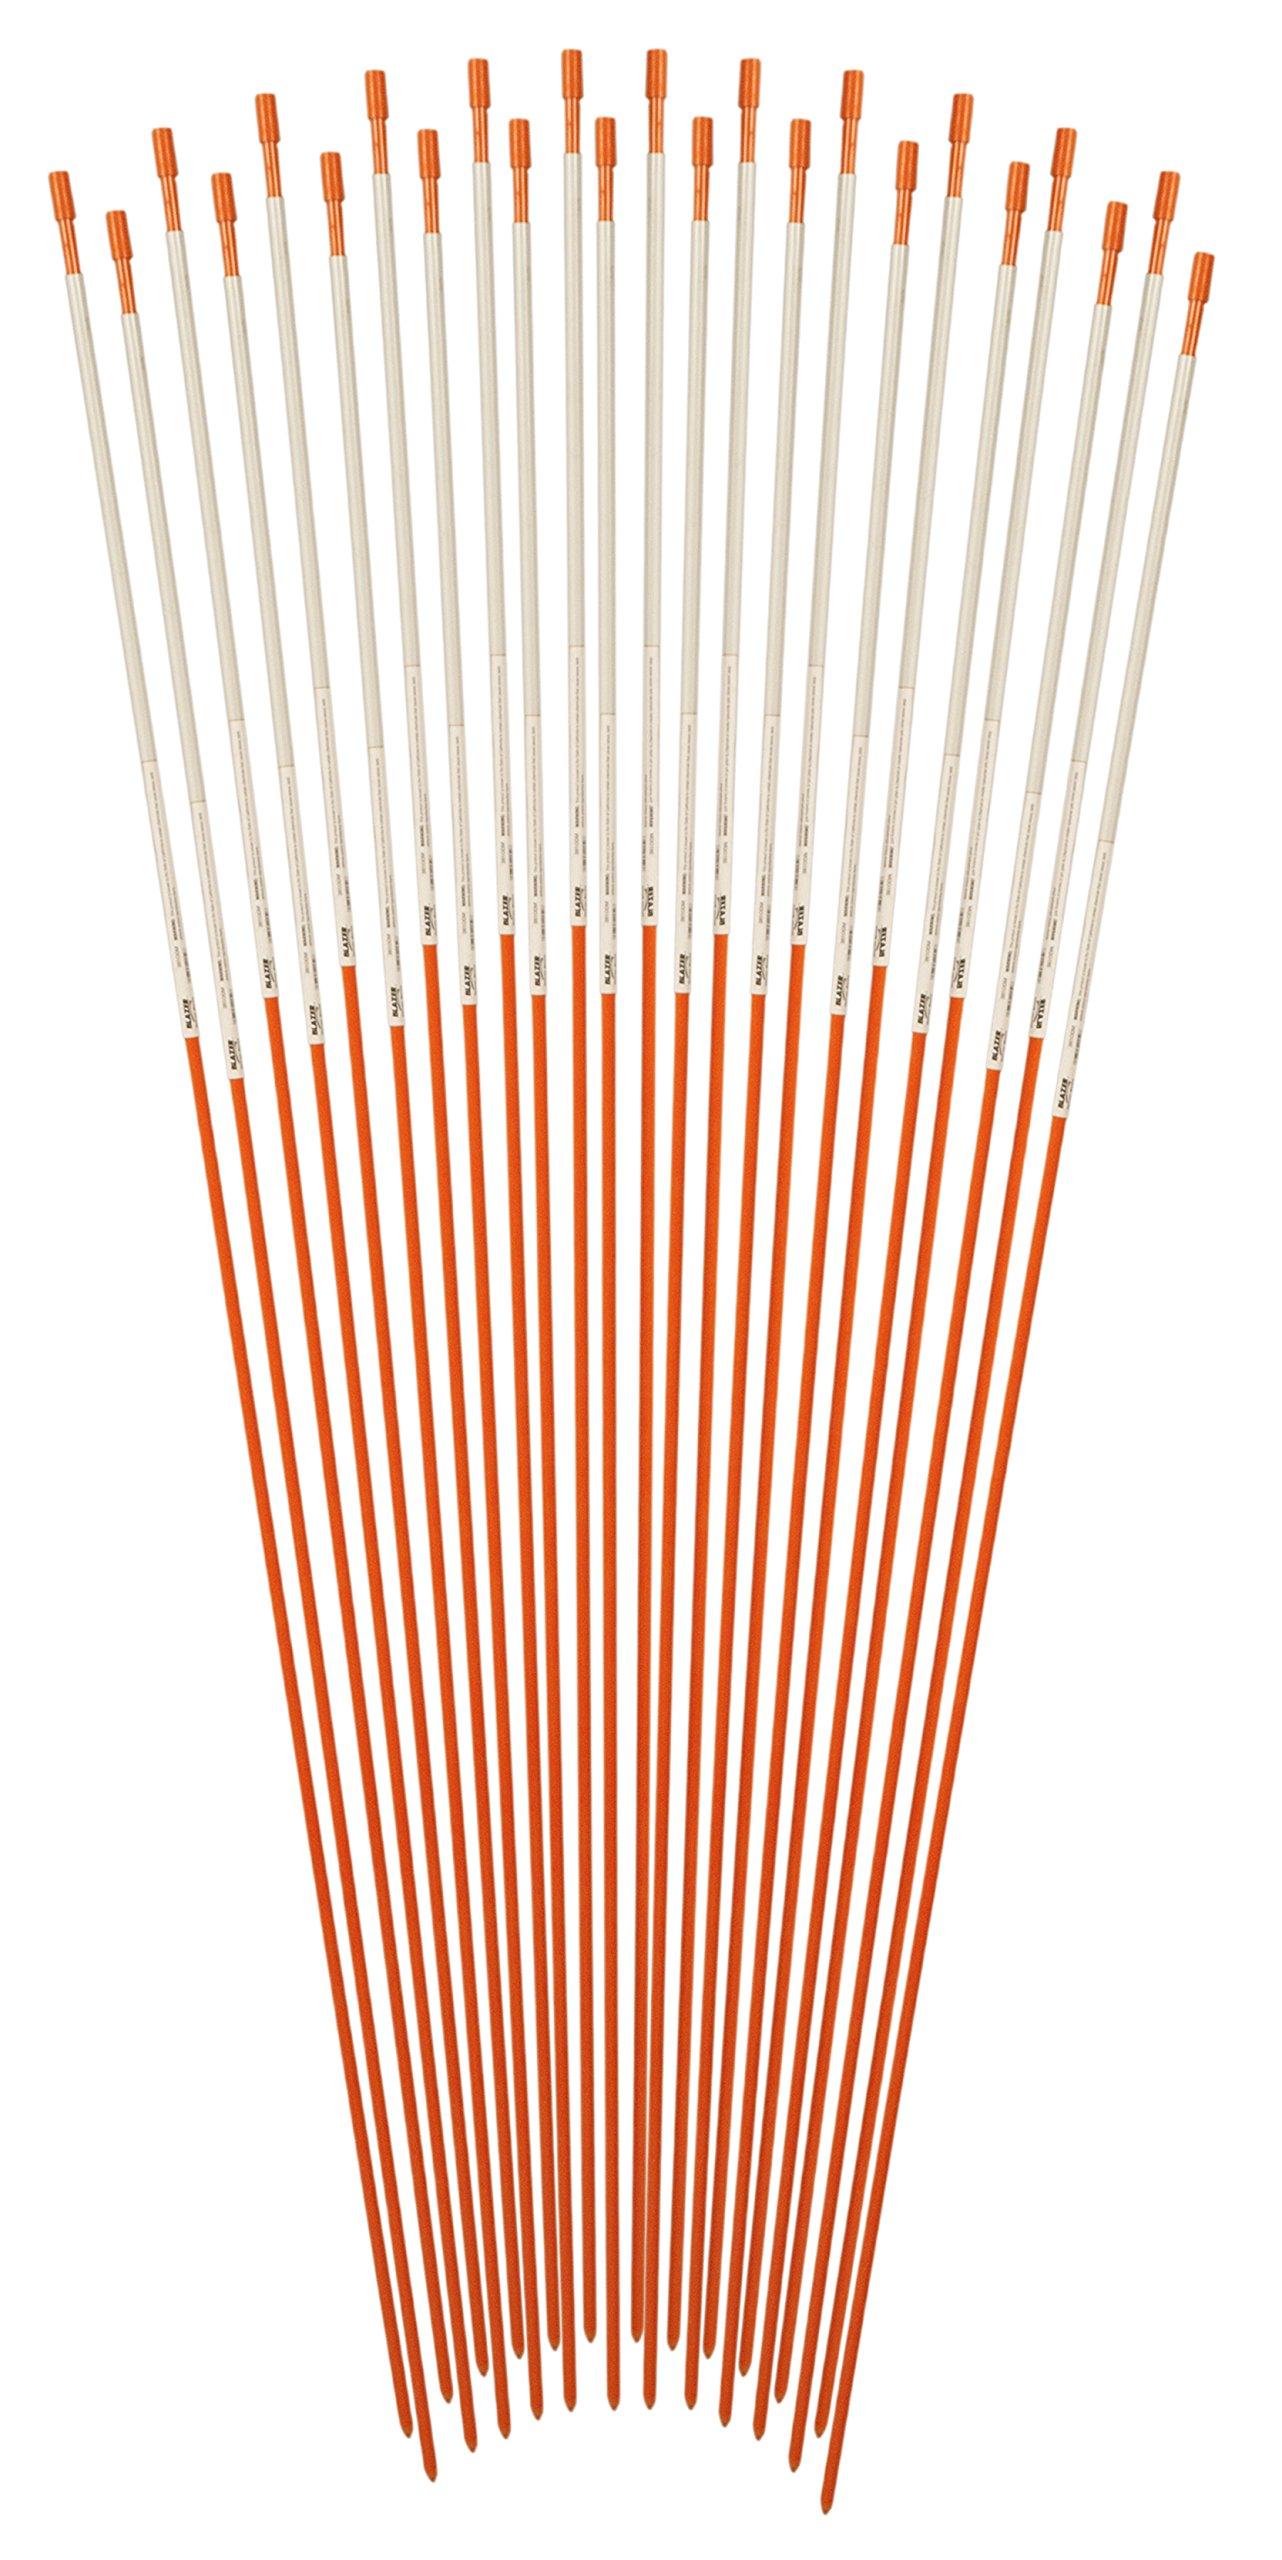 Blazer 372ODM-24 Orange 72'' Reflective Driveway Marker, 24 Pack (Fiberglass Pole) by Blazer International Trailer & Towing Accessories